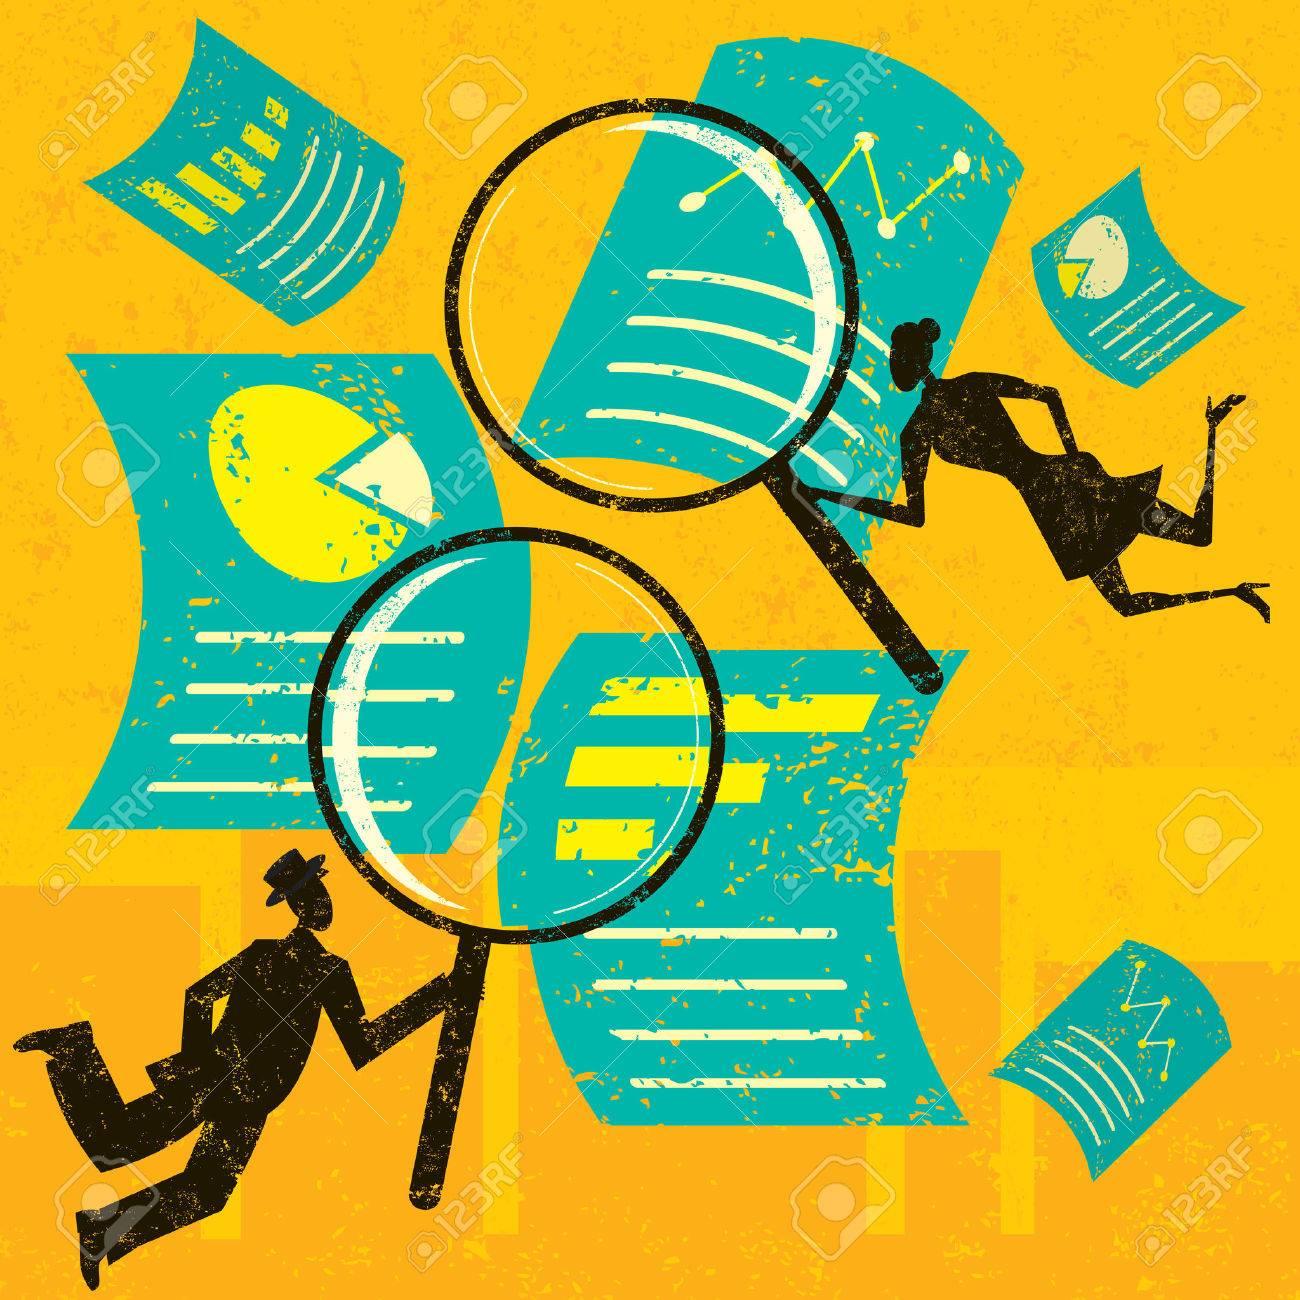 Examining Financial Documents - 41296414